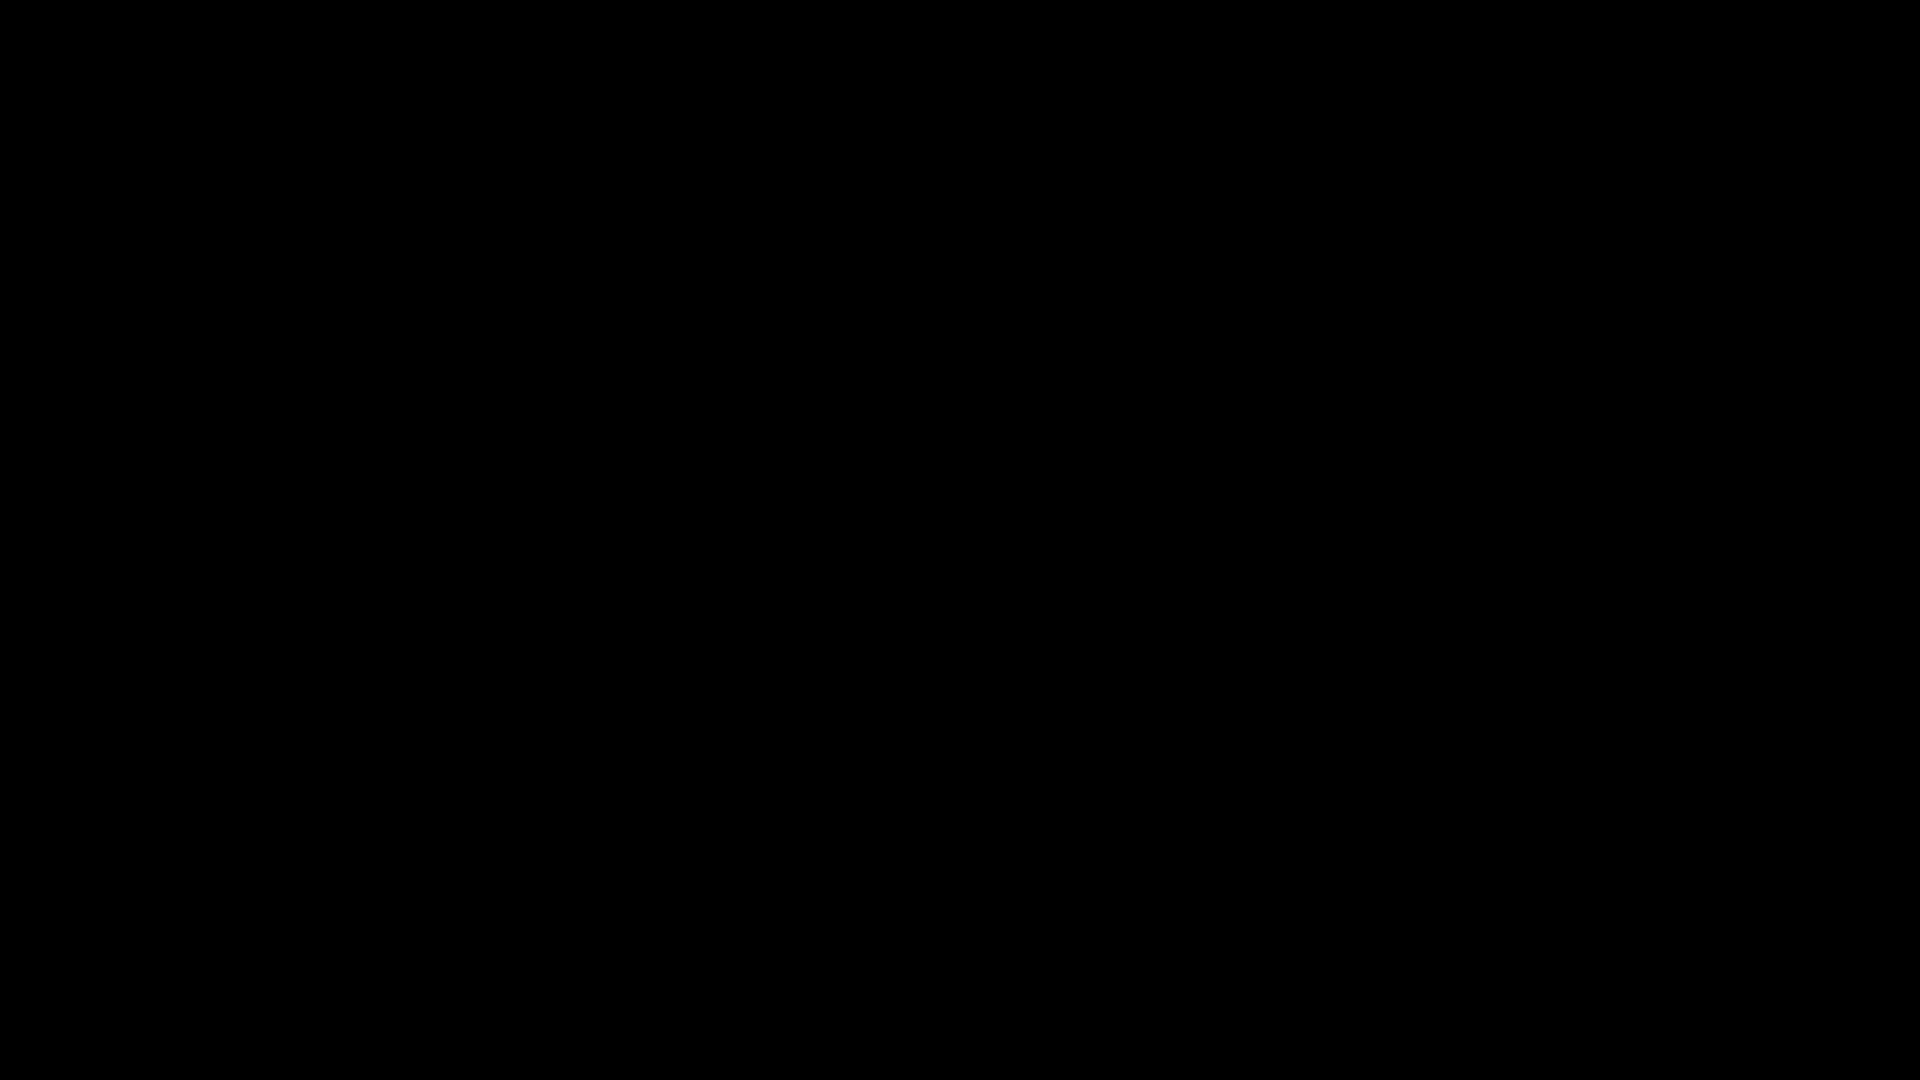 danganronpa, desktop, junko enoshima, rainmeter, wallpaper engine, Danganronpa Rainmeter GIFs